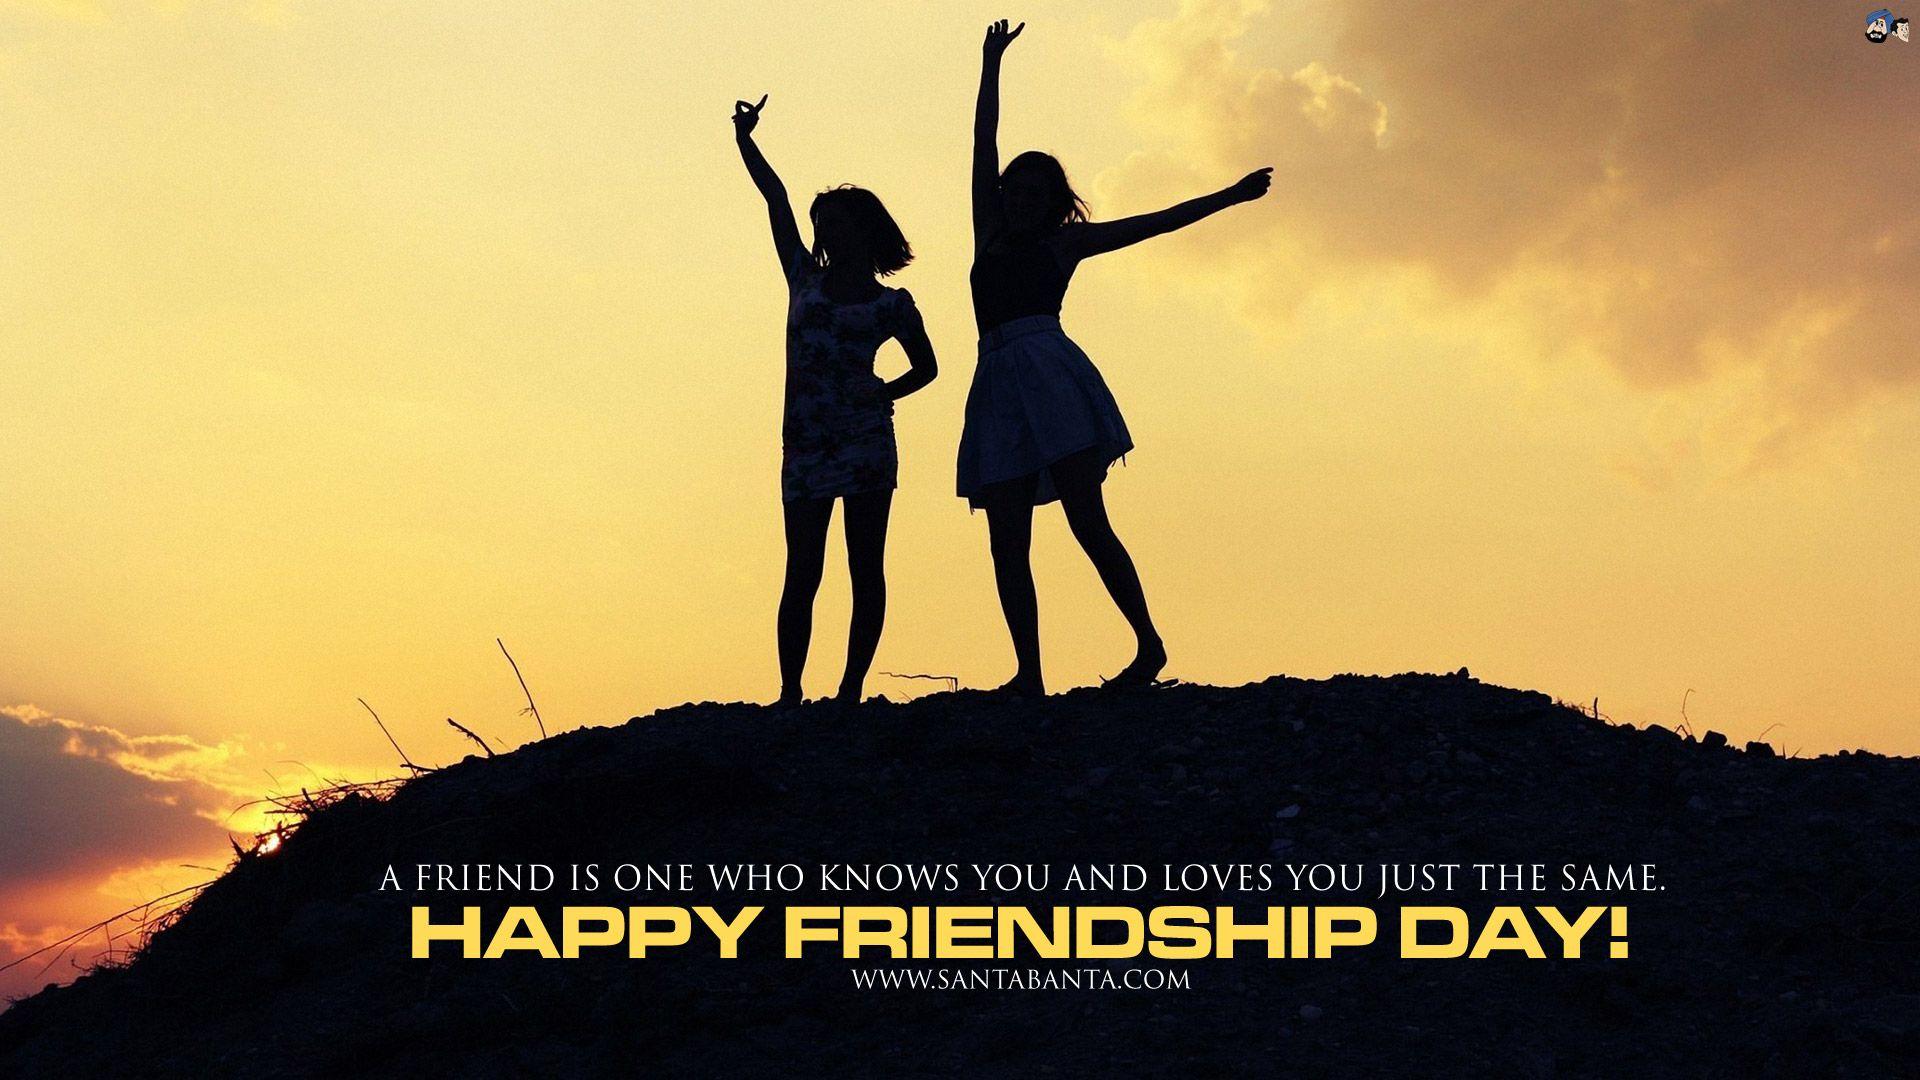 Happy friendship day hd wallpapers romantic friendship day wishes happy friendship day hd wallpapers romantic friendship day wishes messages for whatsapp altavistaventures Images